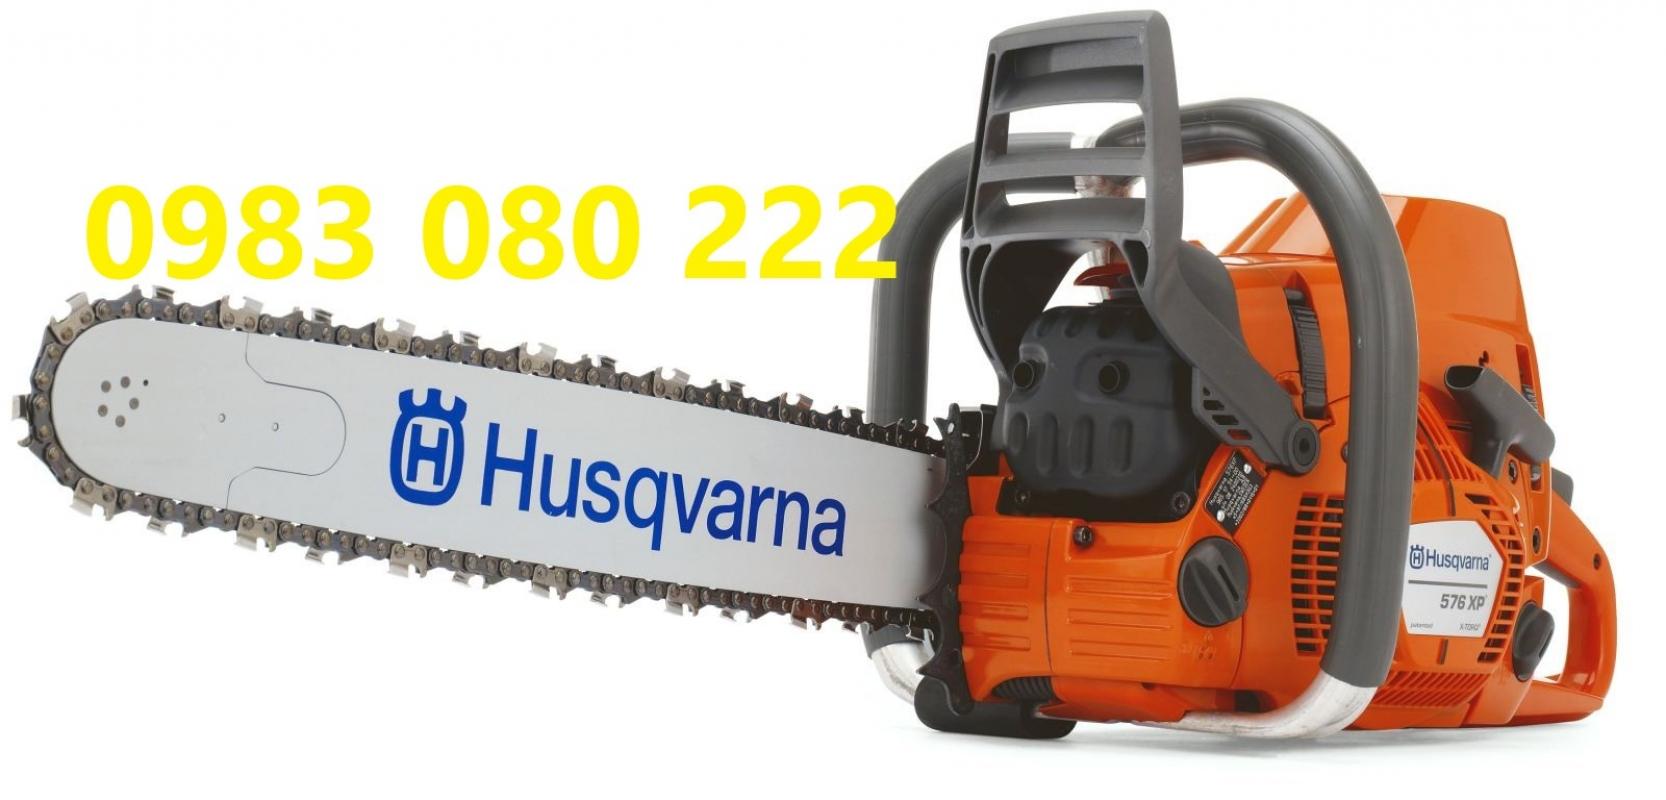 Cưa xích Husqvarna 576 (4.2KW)